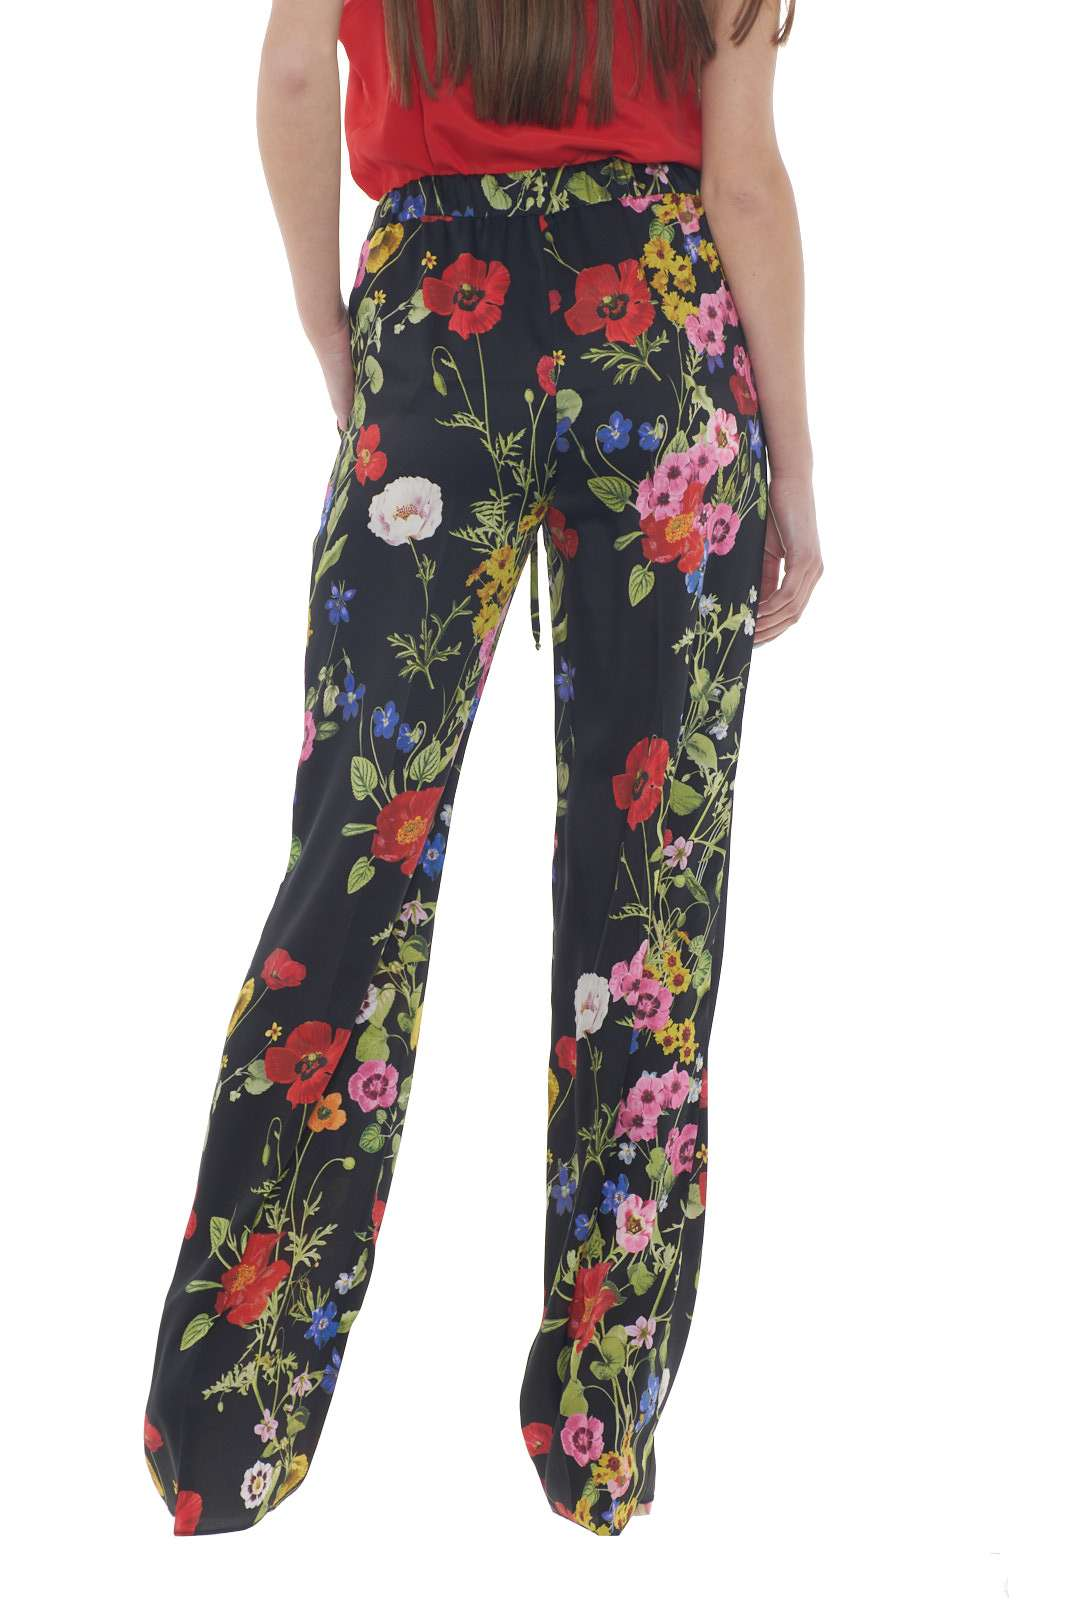 https://www.parmax.com/media/catalog/product/a/i/PE-outlet_parmax-pantaloni-donna-Blue-Girl-5348-C.jpg